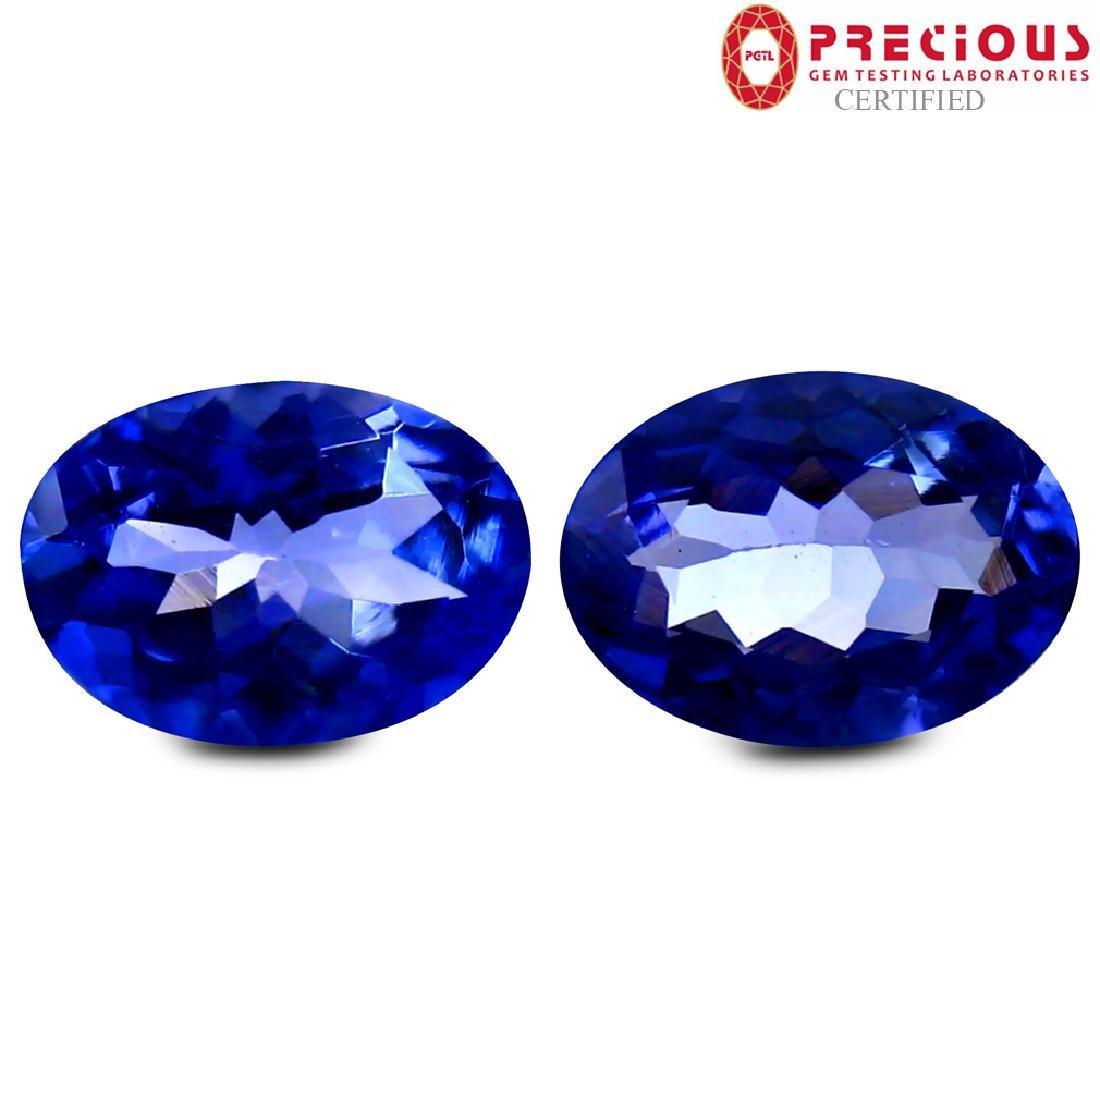 2.01 ct PGTL Certified Valuable Oval Shape Purplish